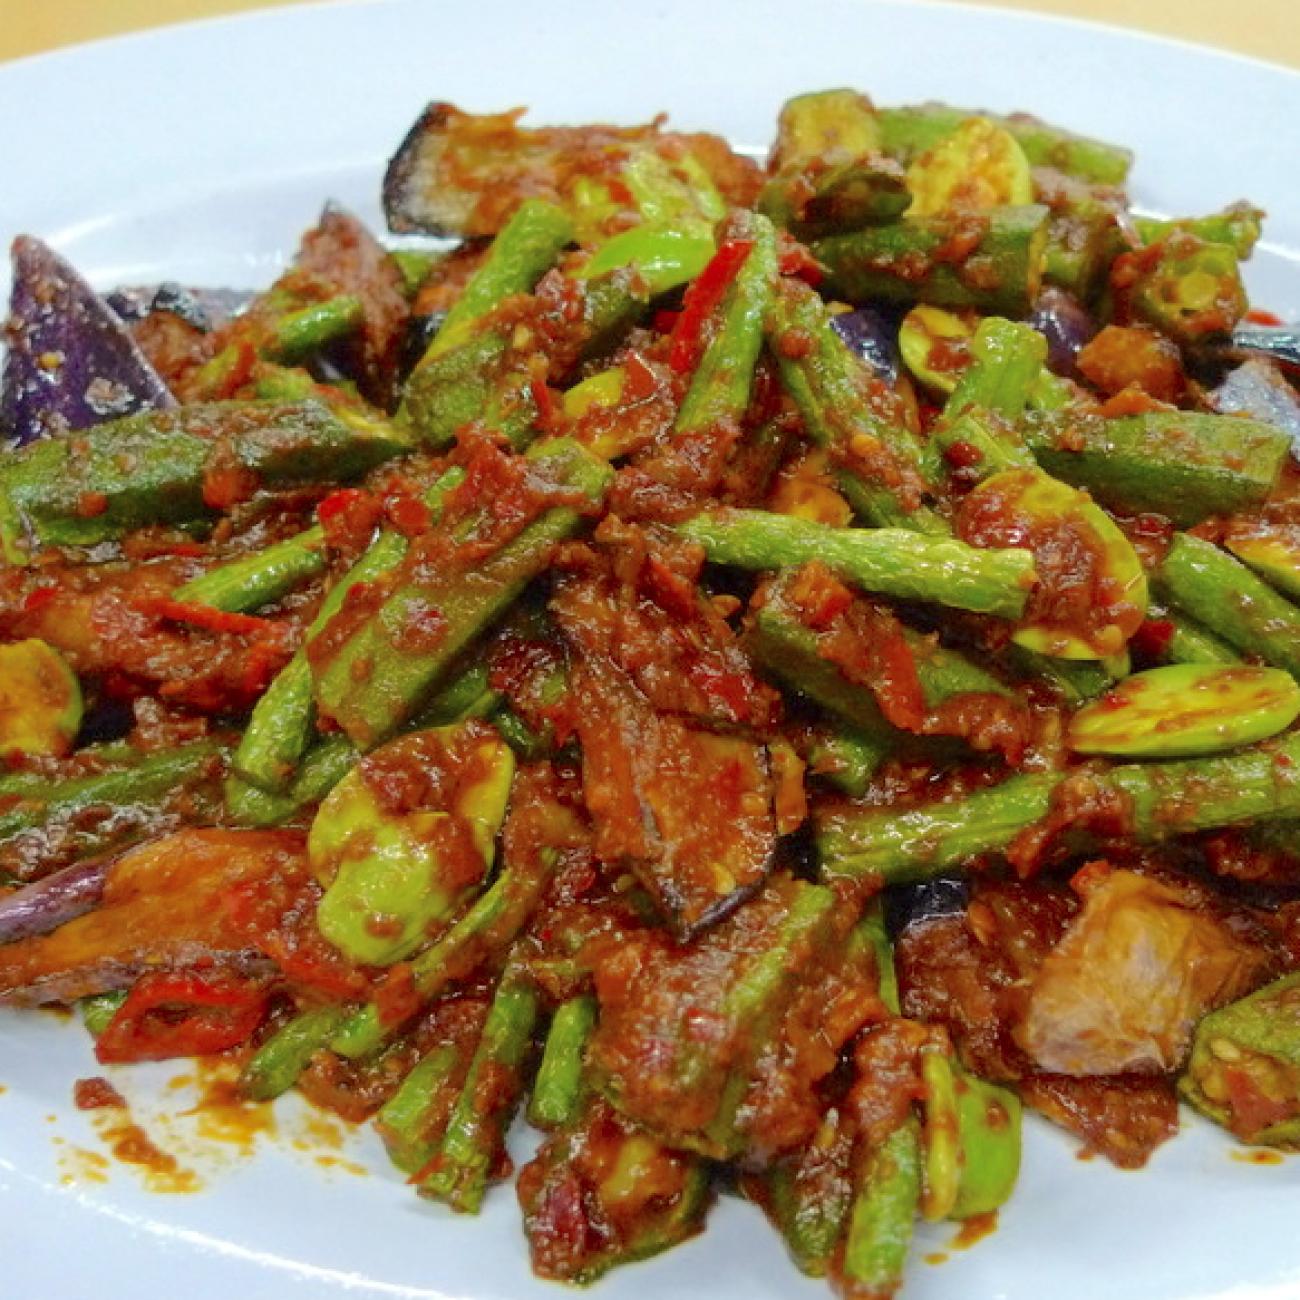 Stir Fry Vegetables with Sambal